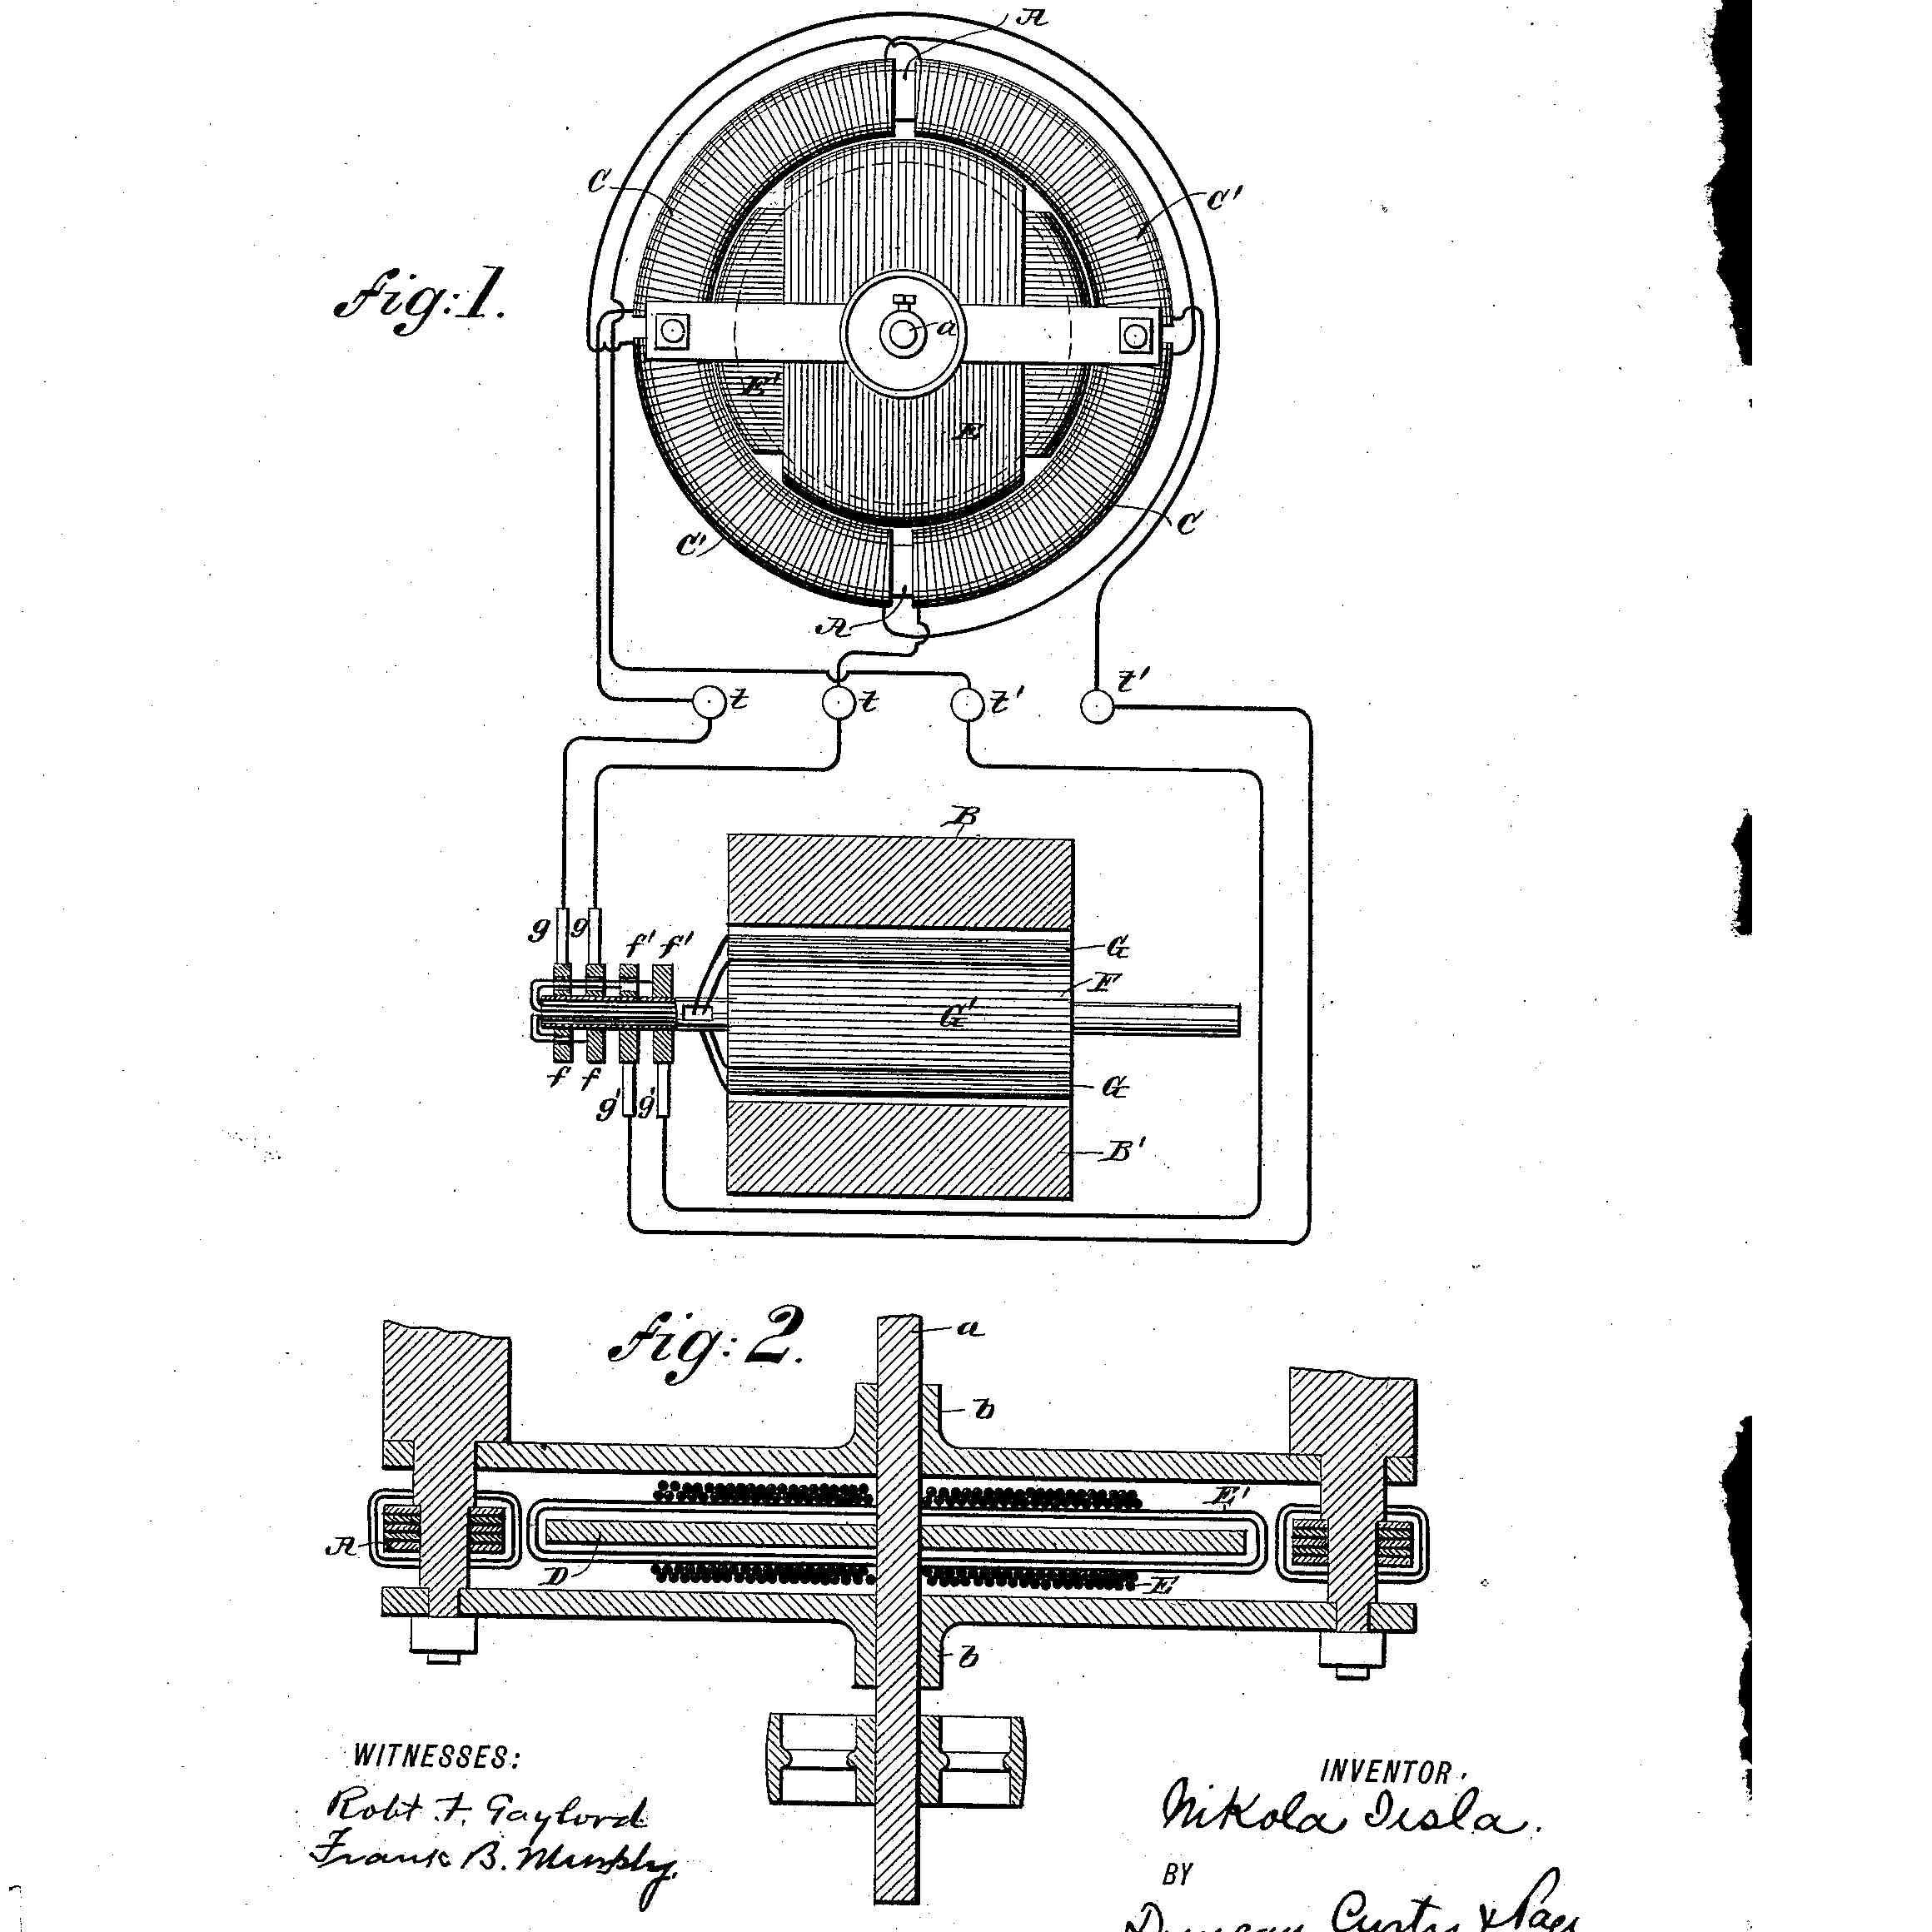 Nikola Tesla's patent for electromagnetic motor, 1888